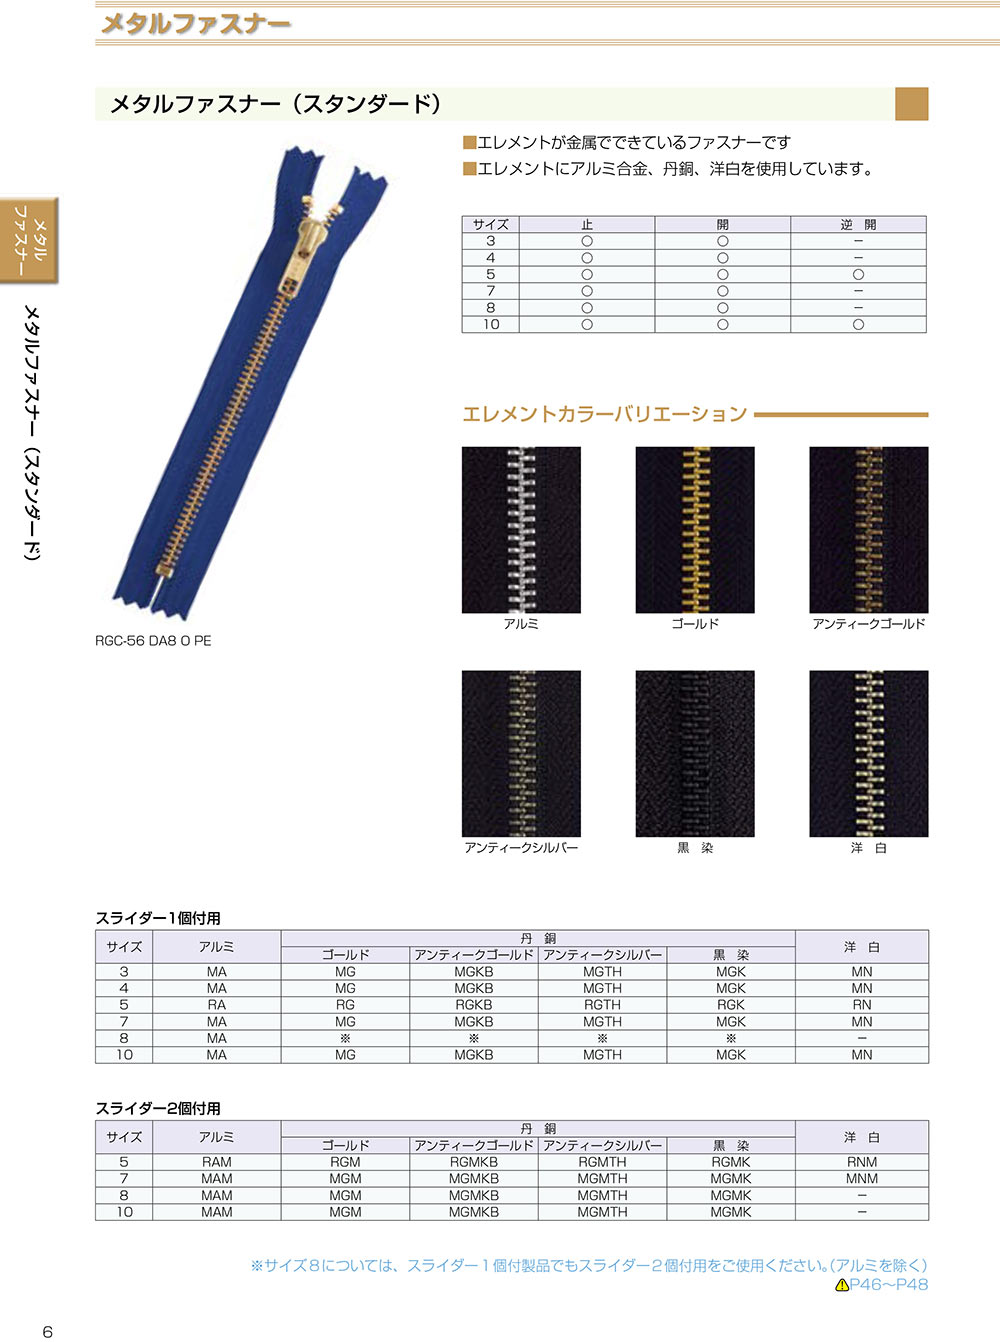 3MGTHC YKK メタルファスナー 3サイズ アンティークシルバー 止め YKK/オークラ商事 - ApparelX アパレル資材卸通販